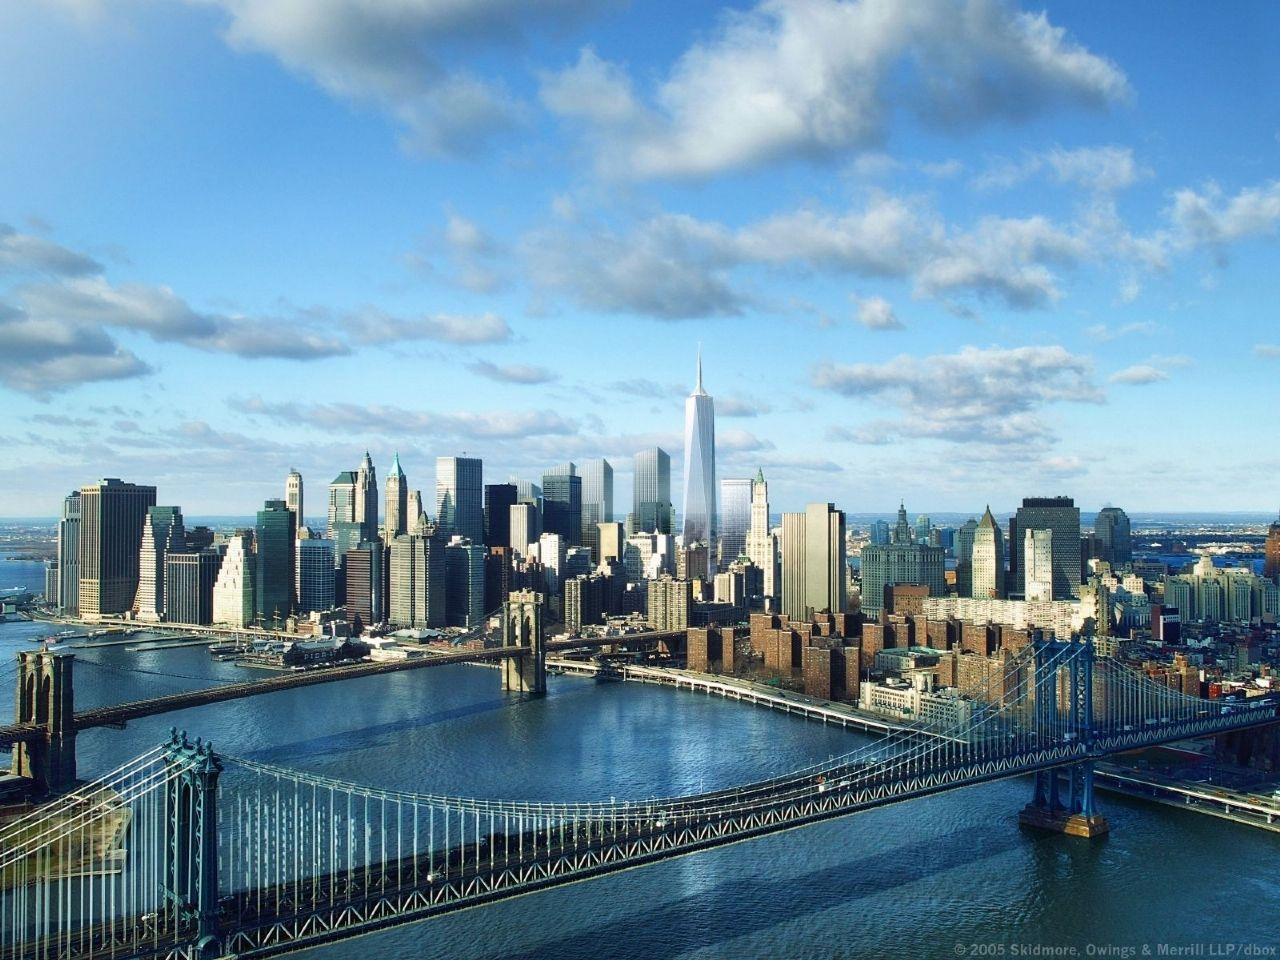 Buildings City Freedom Tower New York desktop wallpaper nr 38542 1280x960